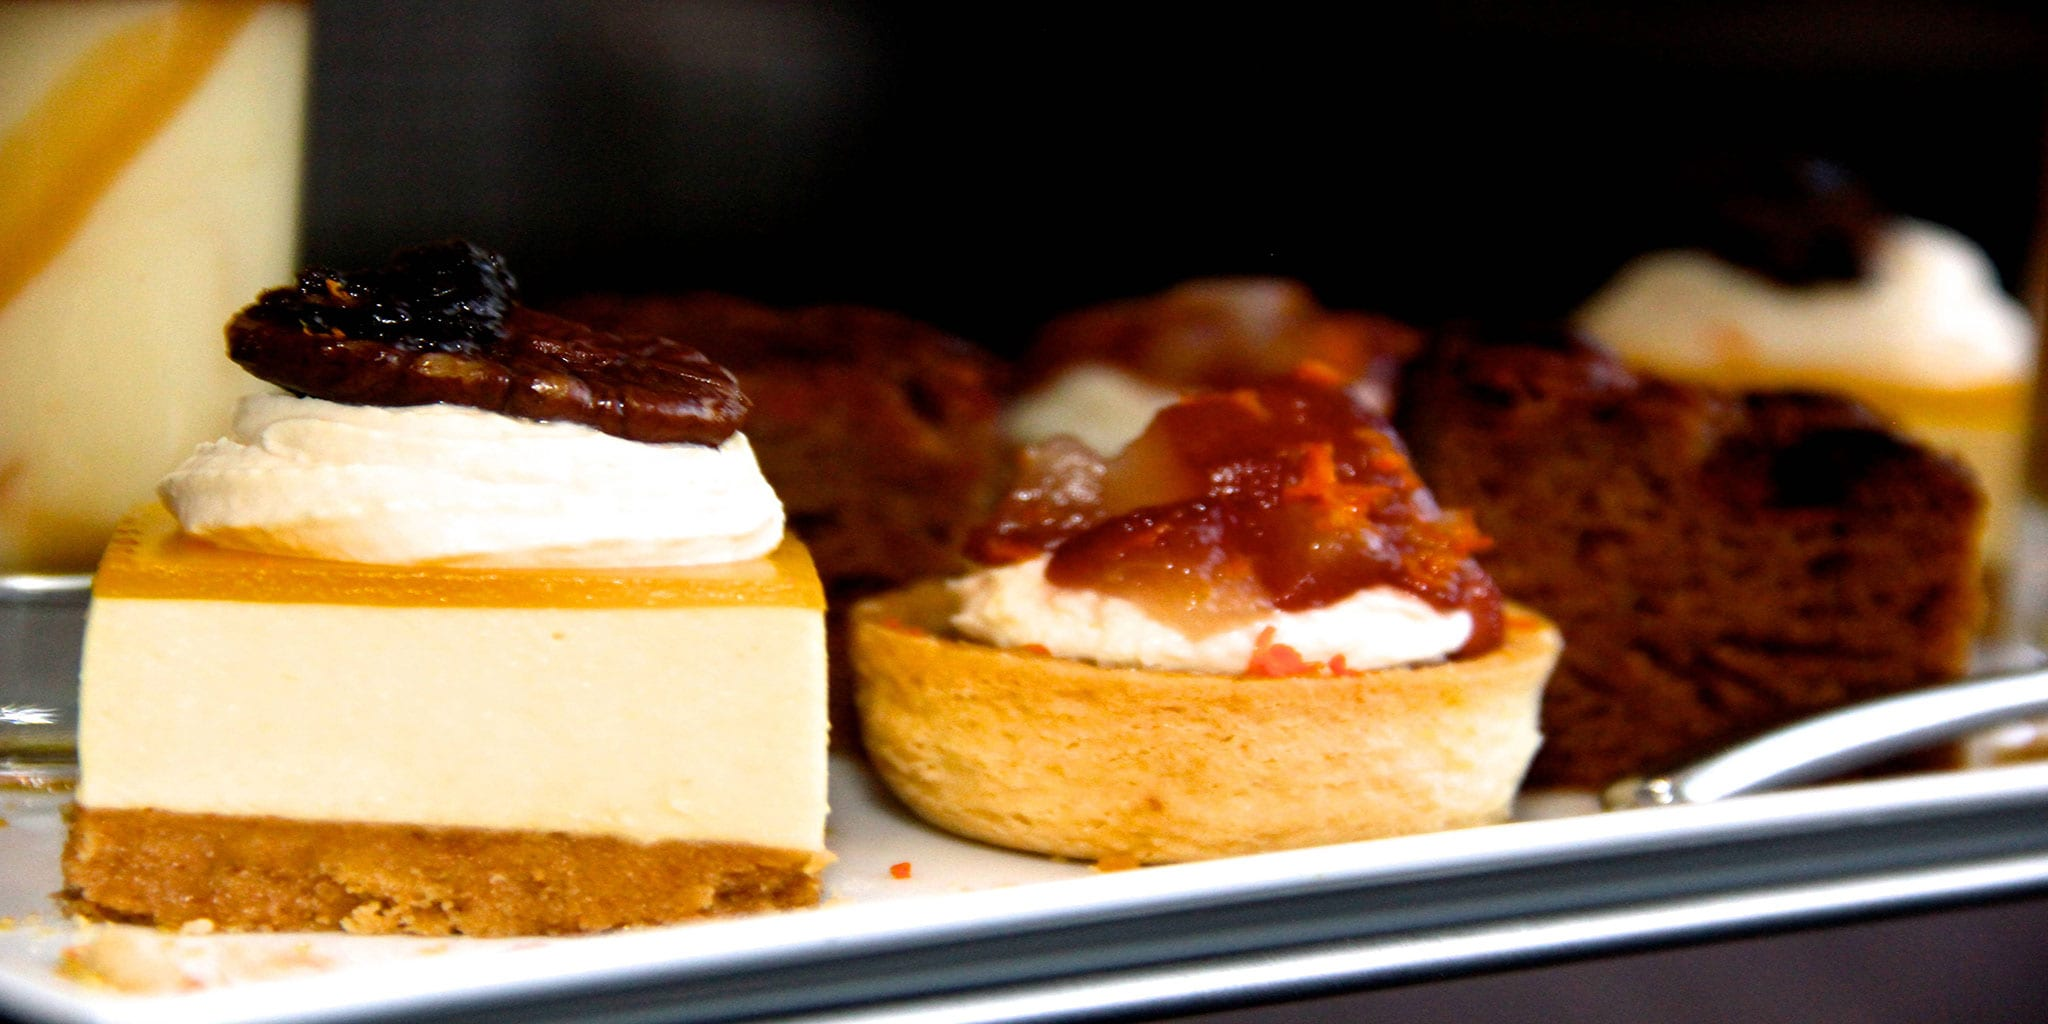 Cakes-and-tarts-at-Clayton-Hotel-Birmingham